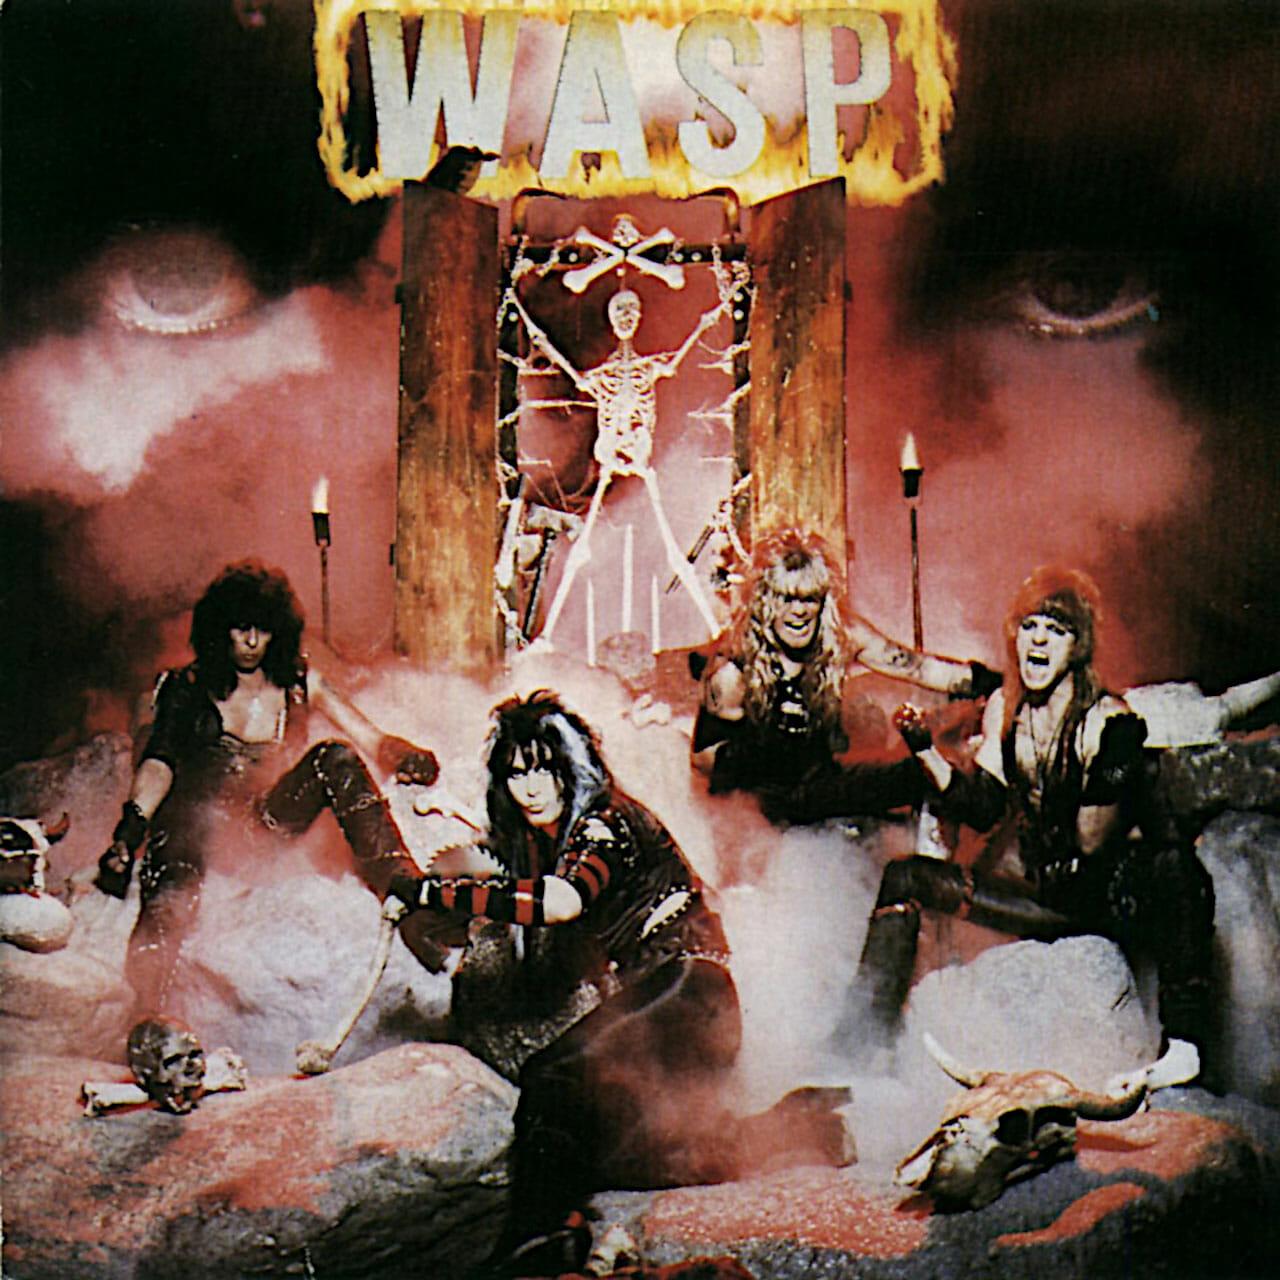 W.A.S.P. W.A.S.P.